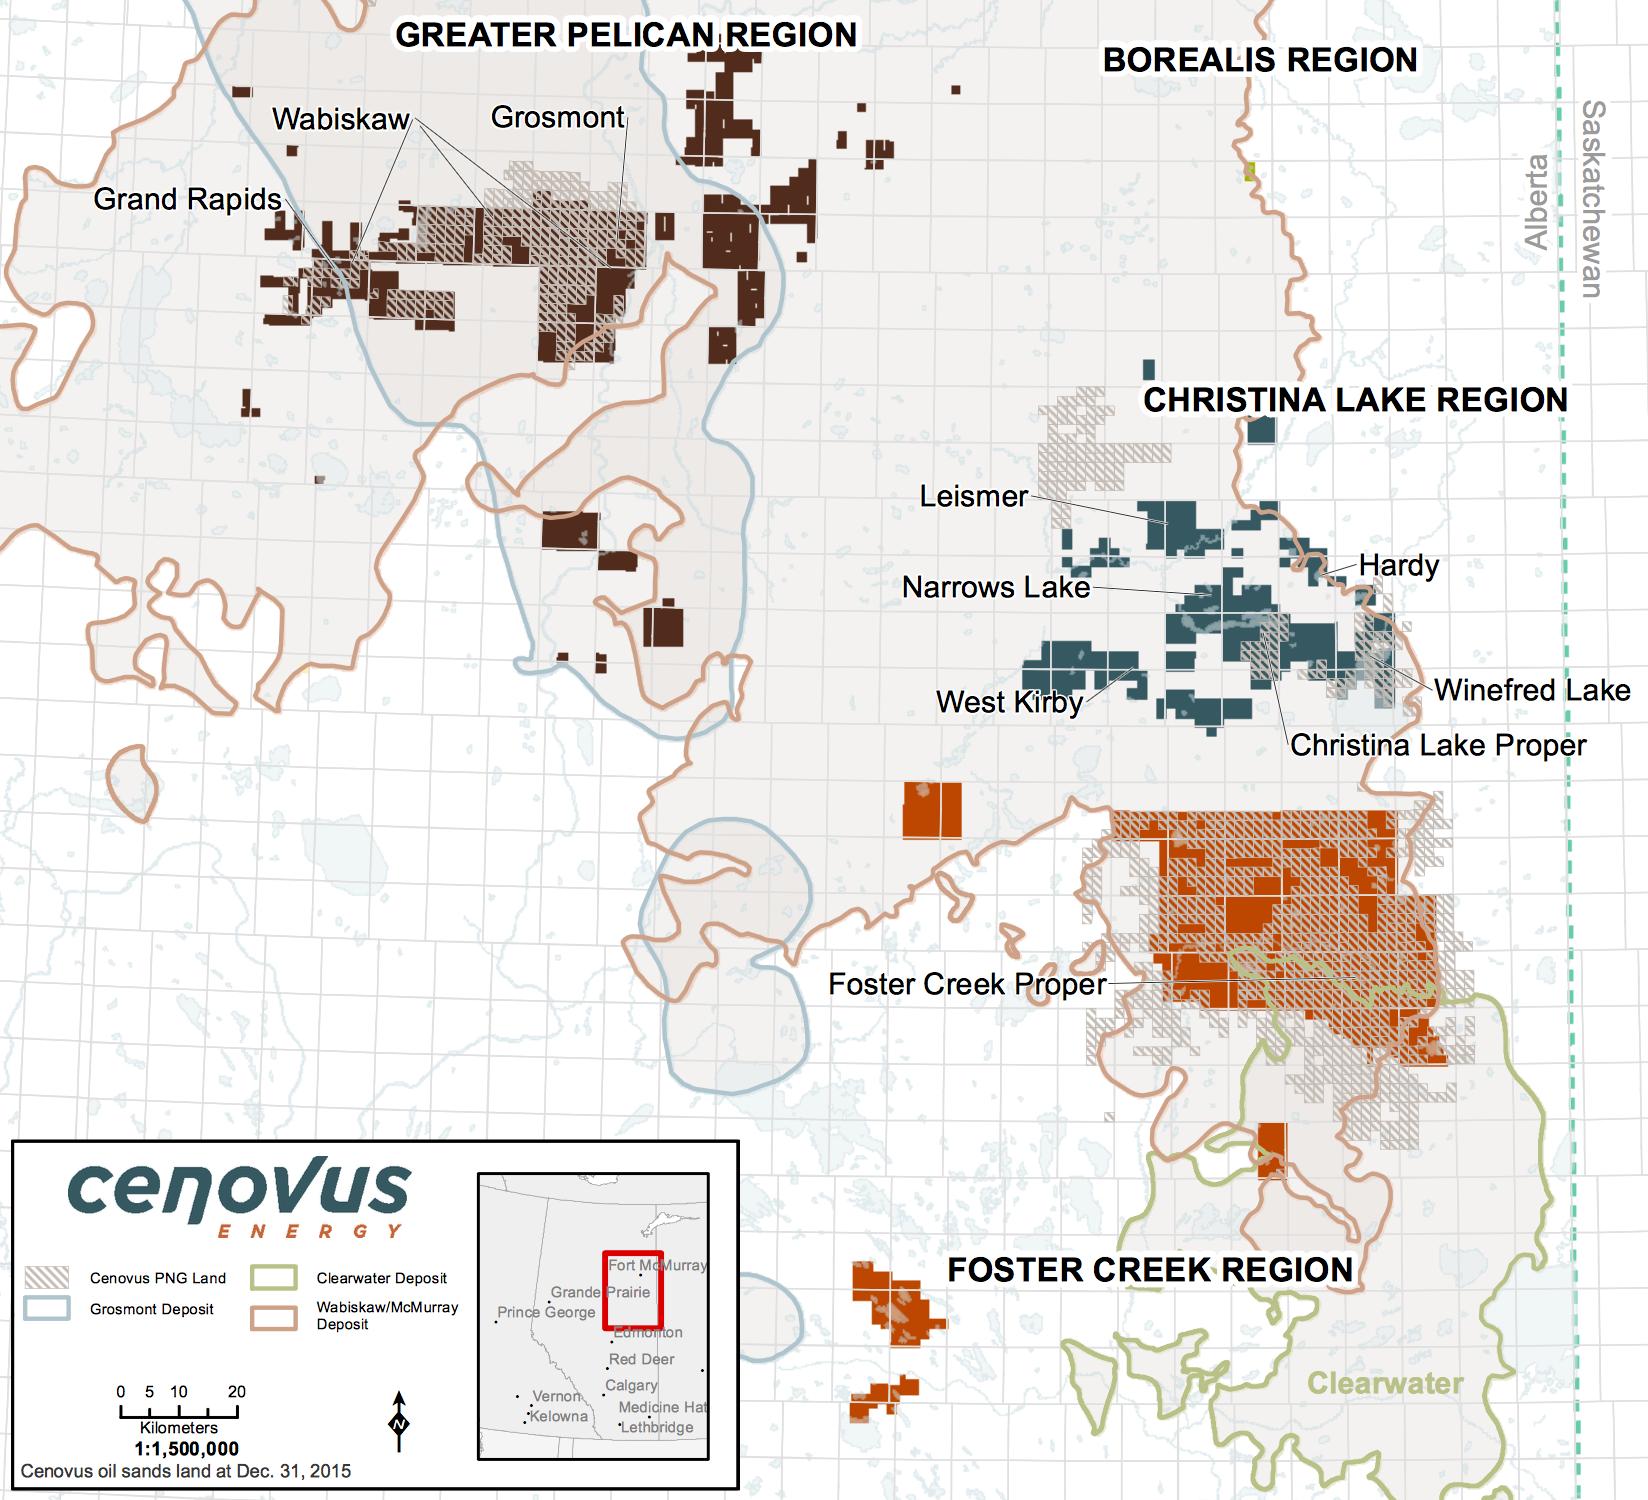 OIL SANDS LEASE MAP (COURTESY CENOVUS ENERGY)